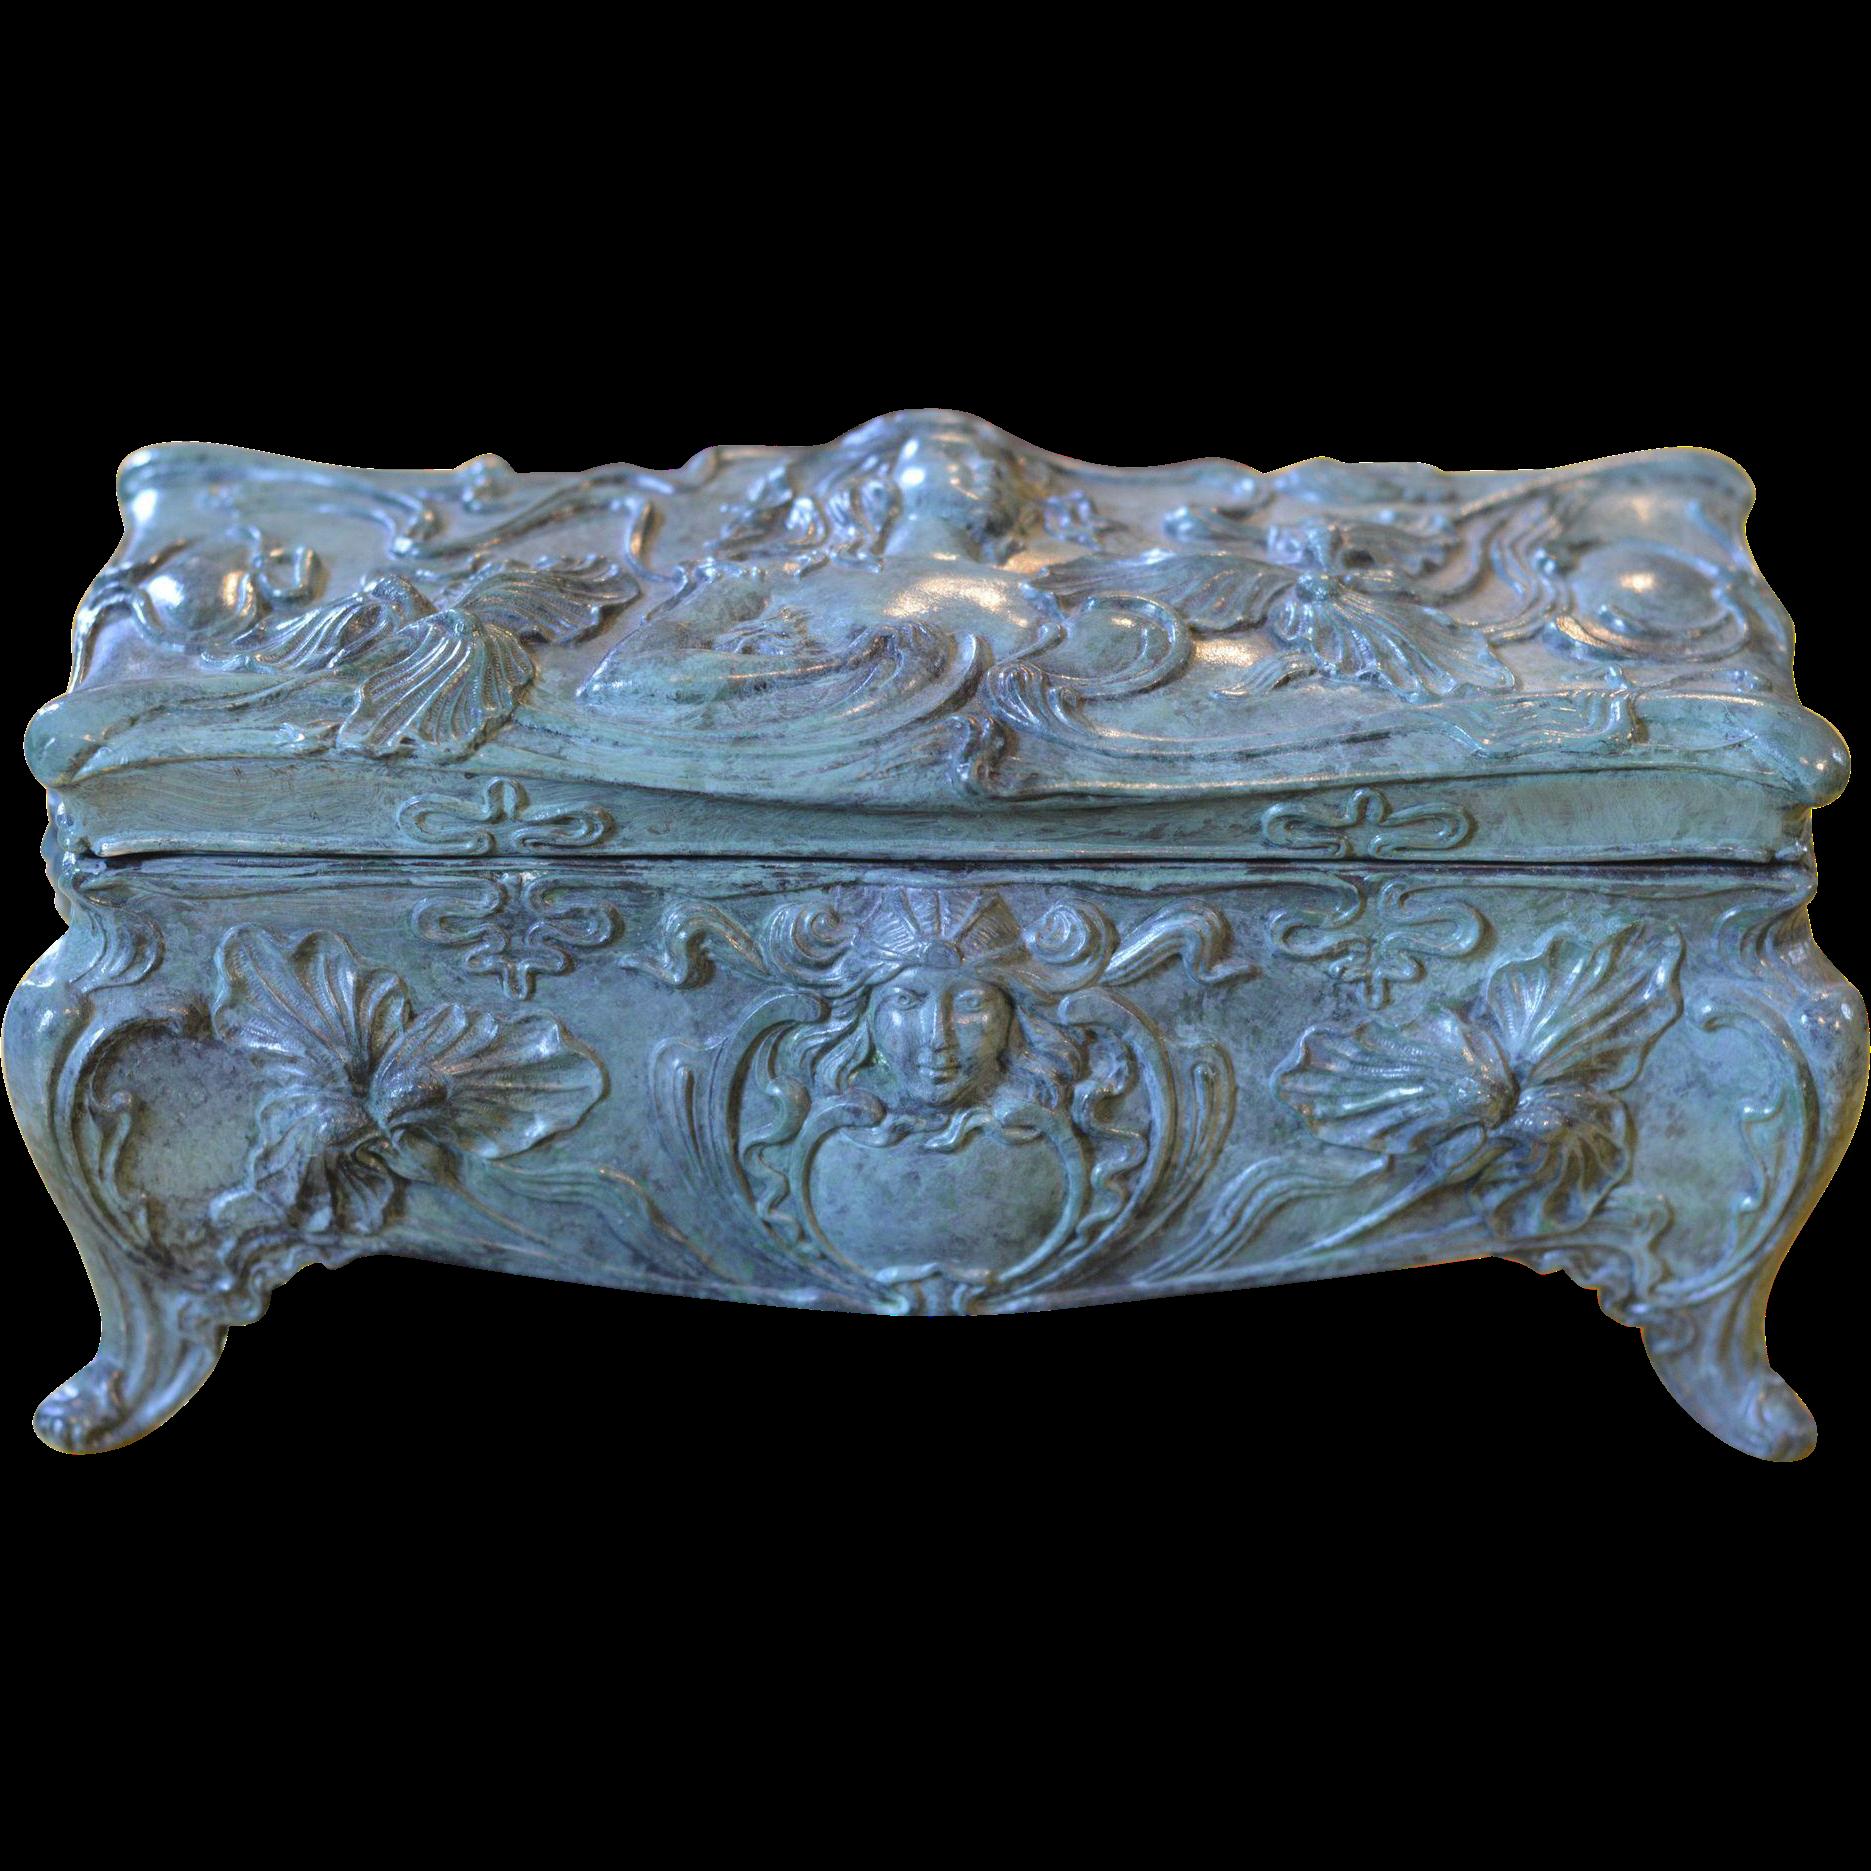 French Coffin Jewelry Box ca. 1925